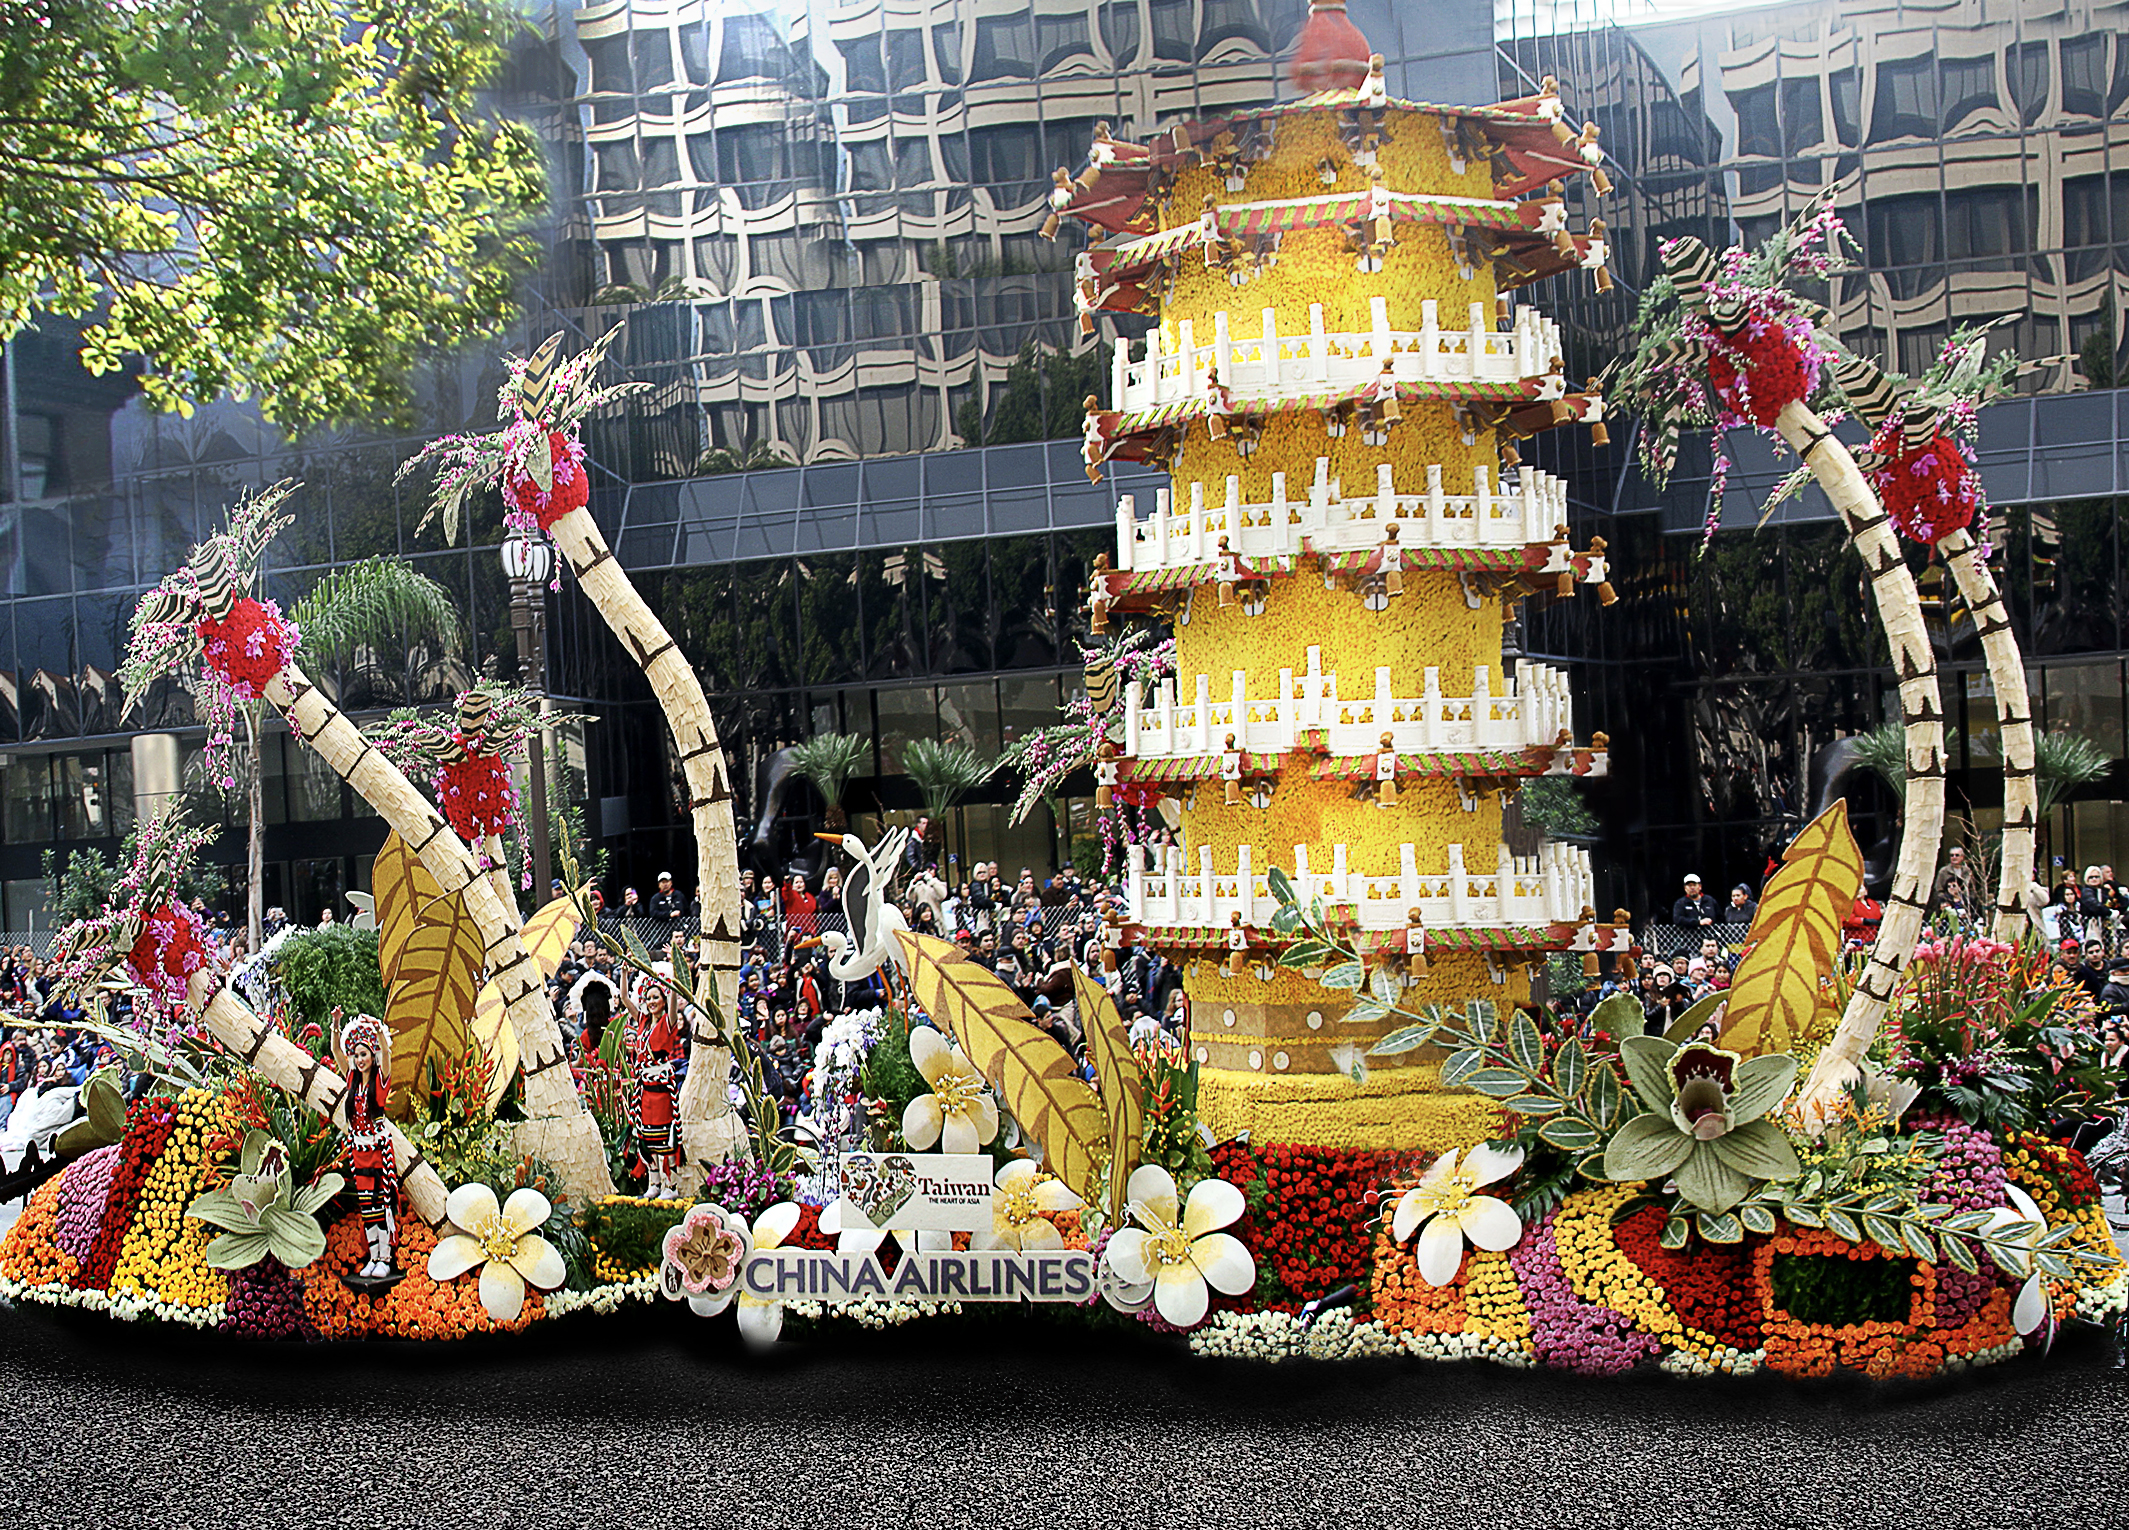 roseparade winning entries-china airline-pagoda 2.jpg